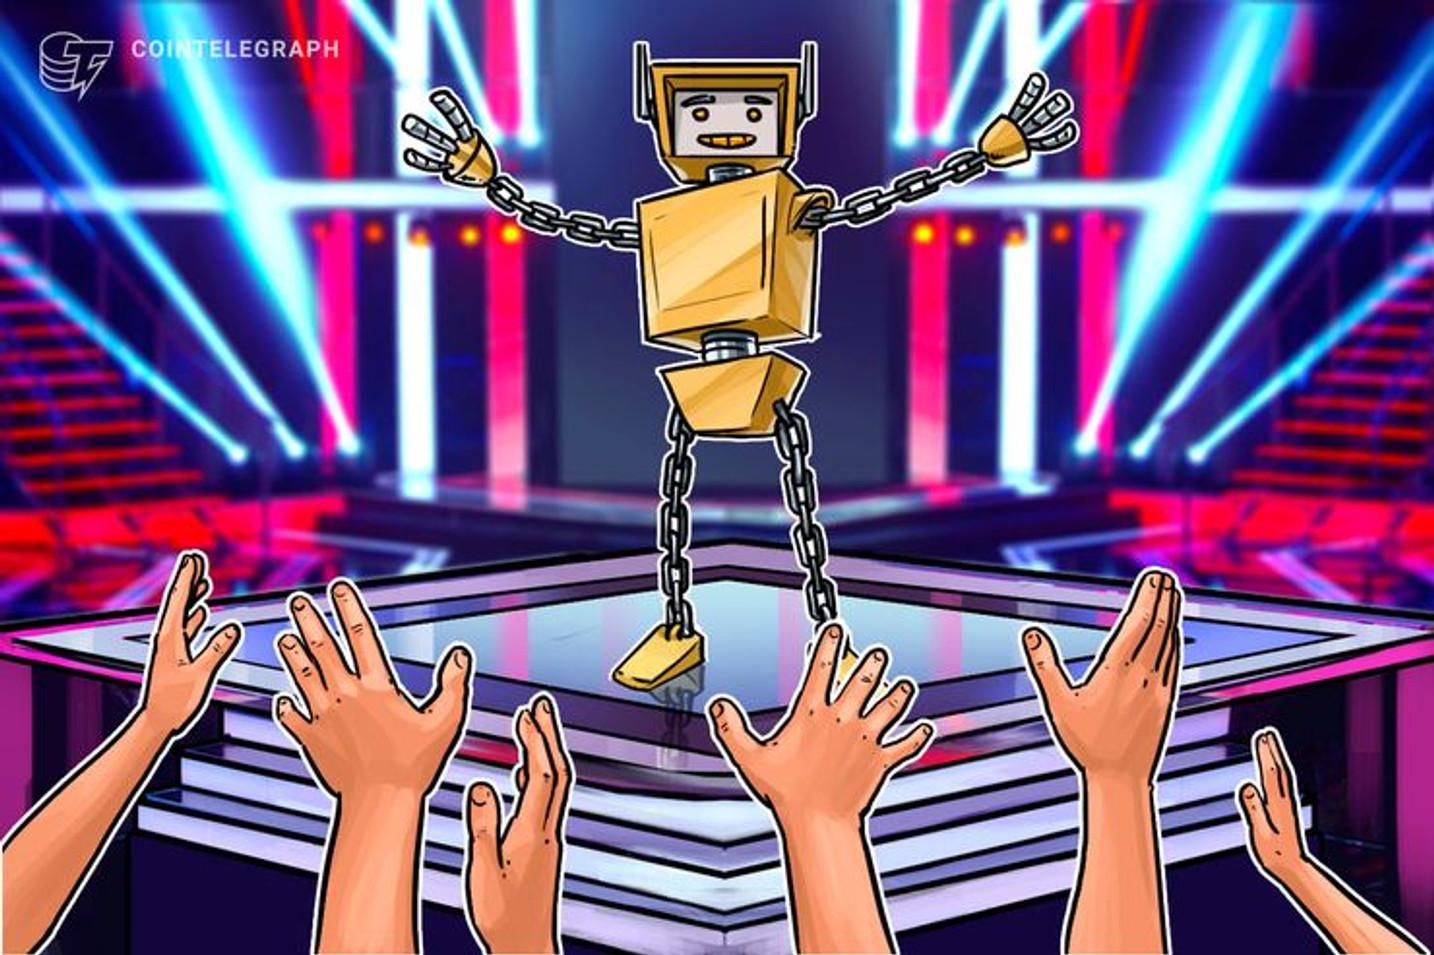 Argentina: Convocatoria para acceder a la red Open Future Telefónica incluye iniciativas blockchain